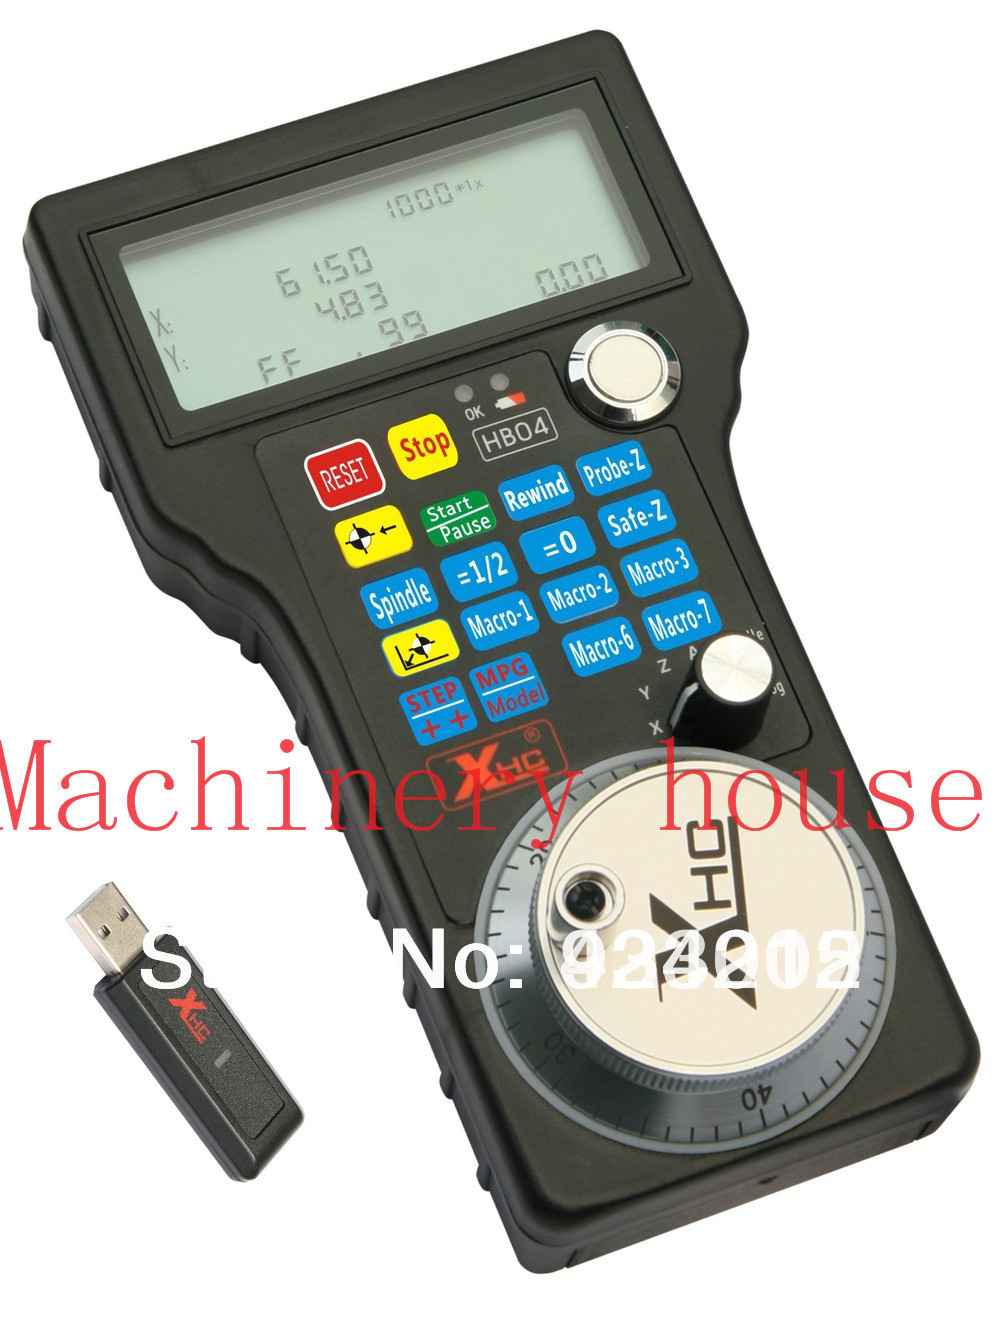 Free Shipping Wireless Mach3 MPG Pendant Handwheel for CNC Mac.Mach 3, 4 axis Wholesale Price (HandWheel-04) best price universal cnc 4 axis mpg pendant handwheel